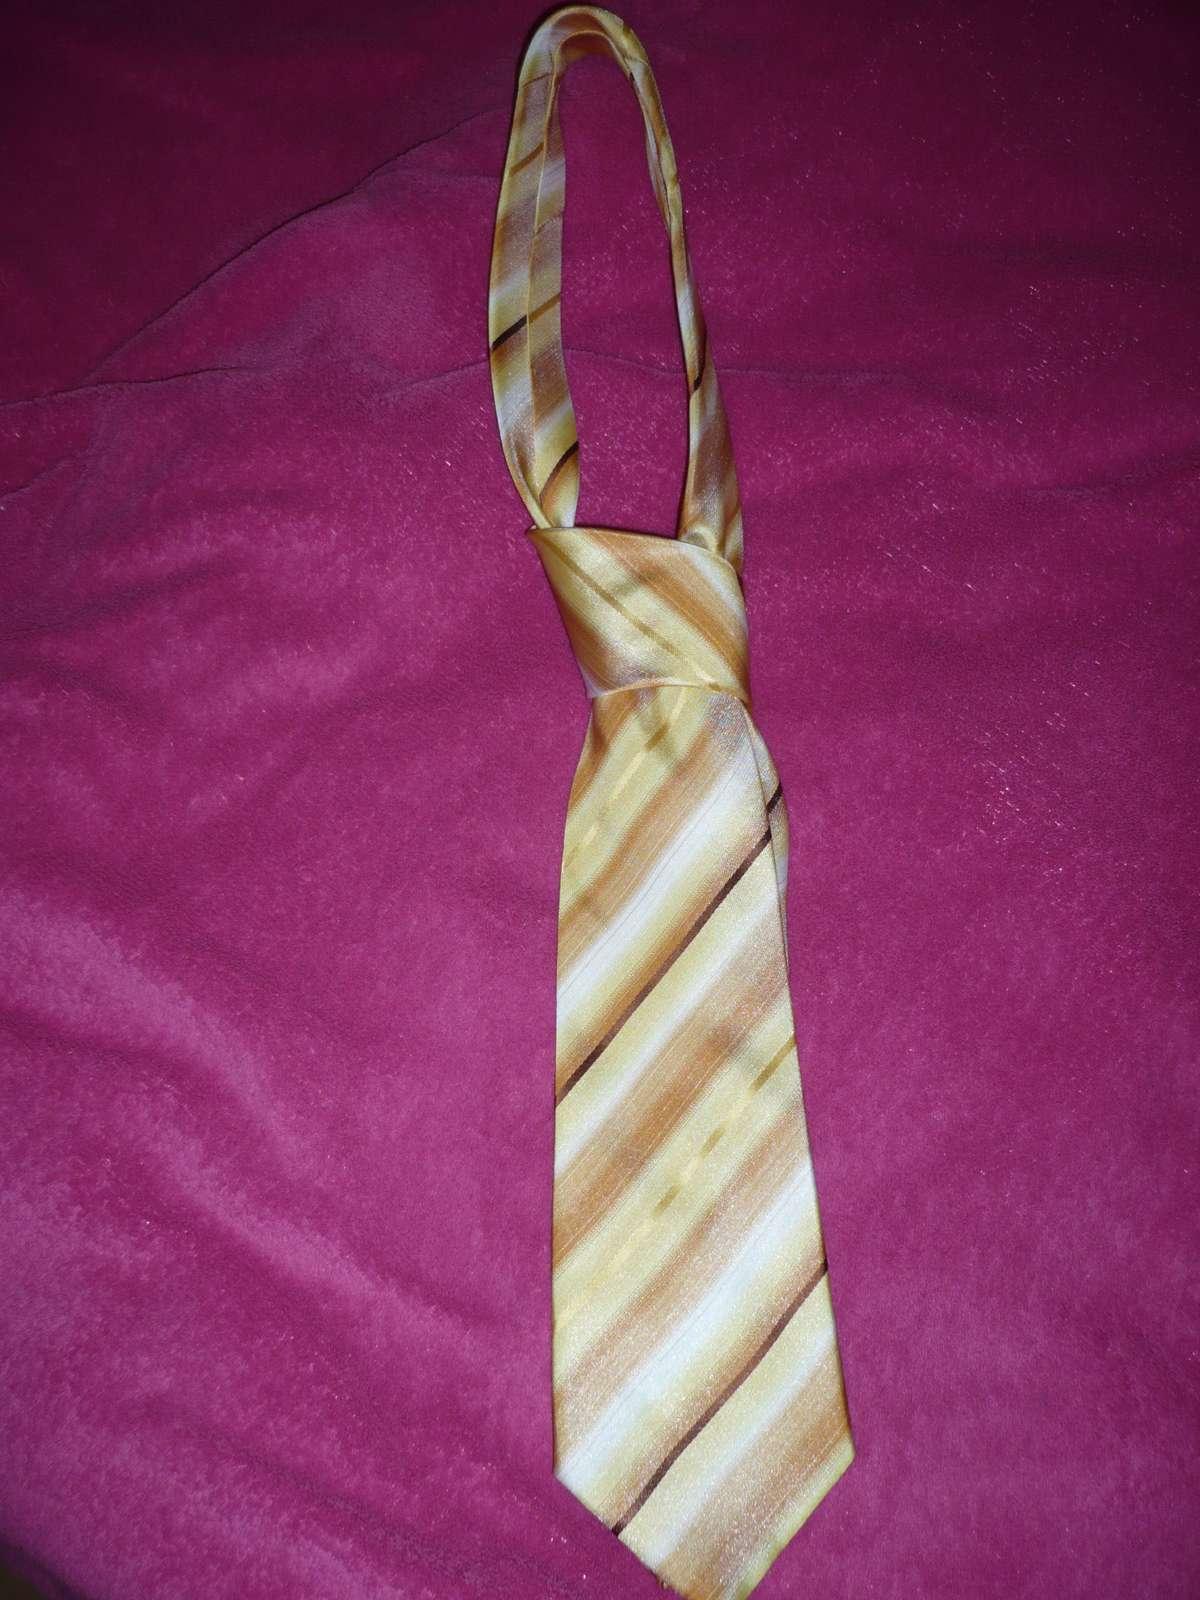 Satenova kravata zlta - Obrázok č. 1